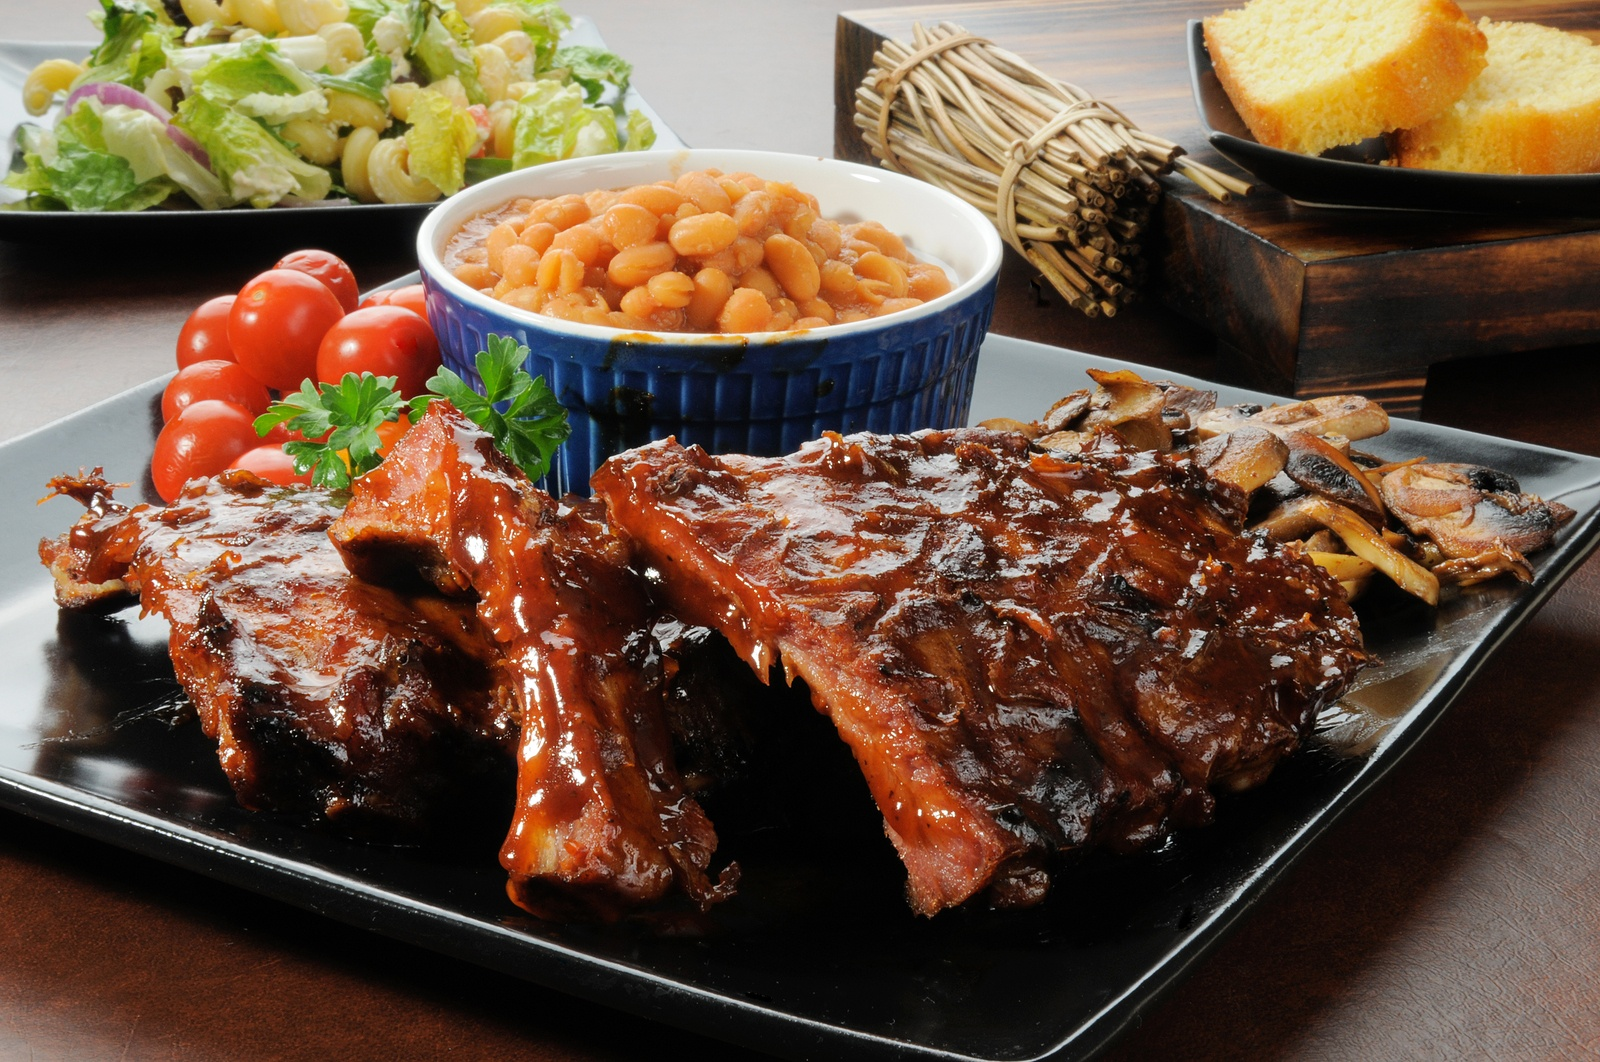 bigstock-Barbecue-Ribs-23954729.jpg